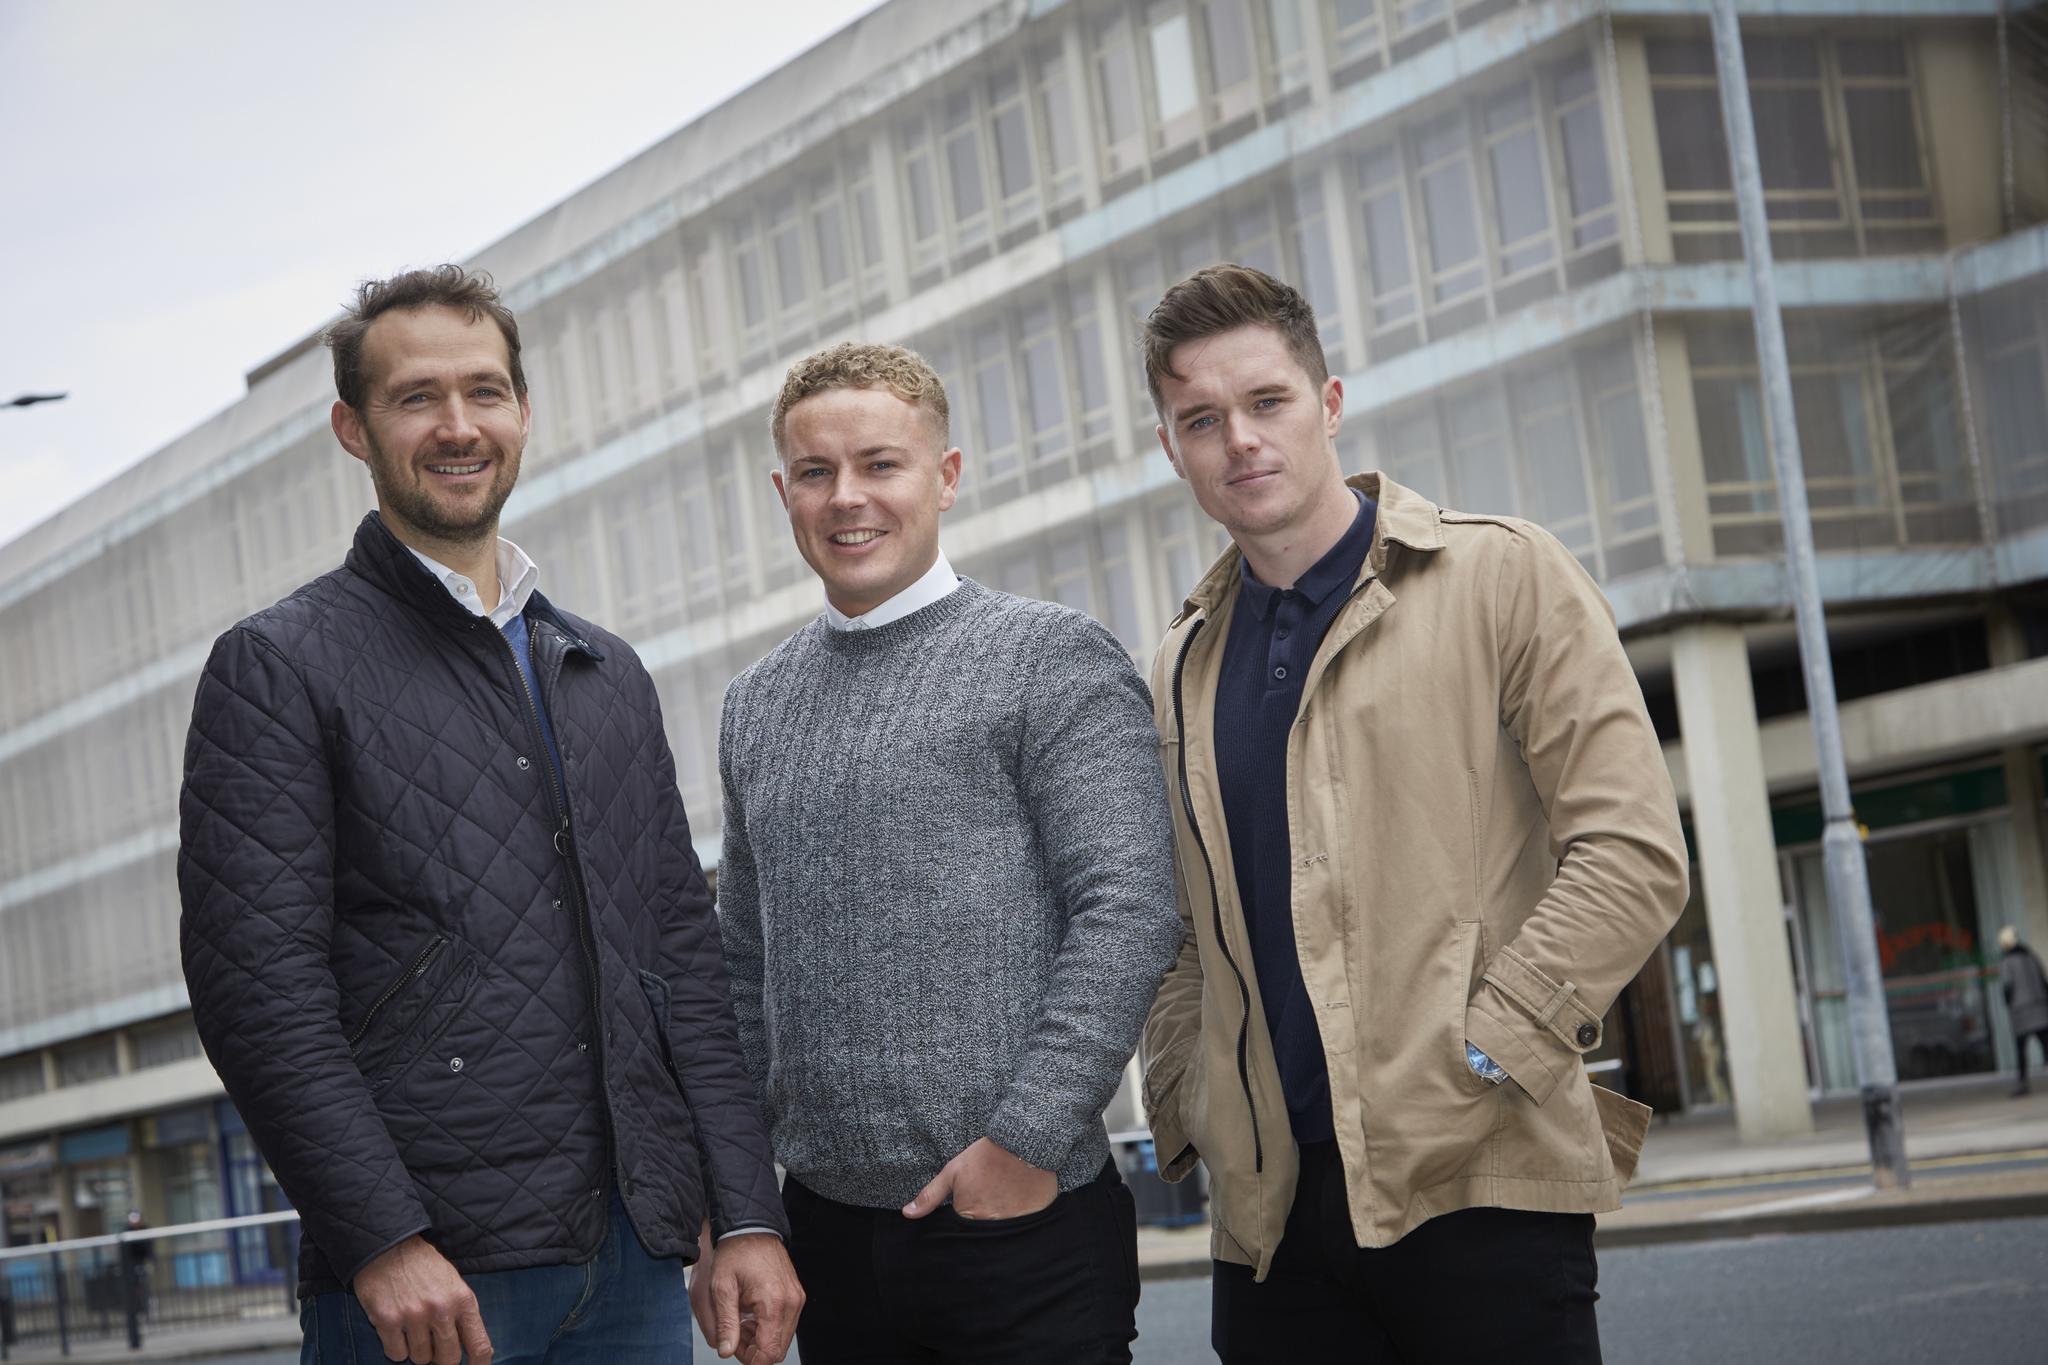 Hull's 'most advanced' wireless broadband to be installed at new K2 development